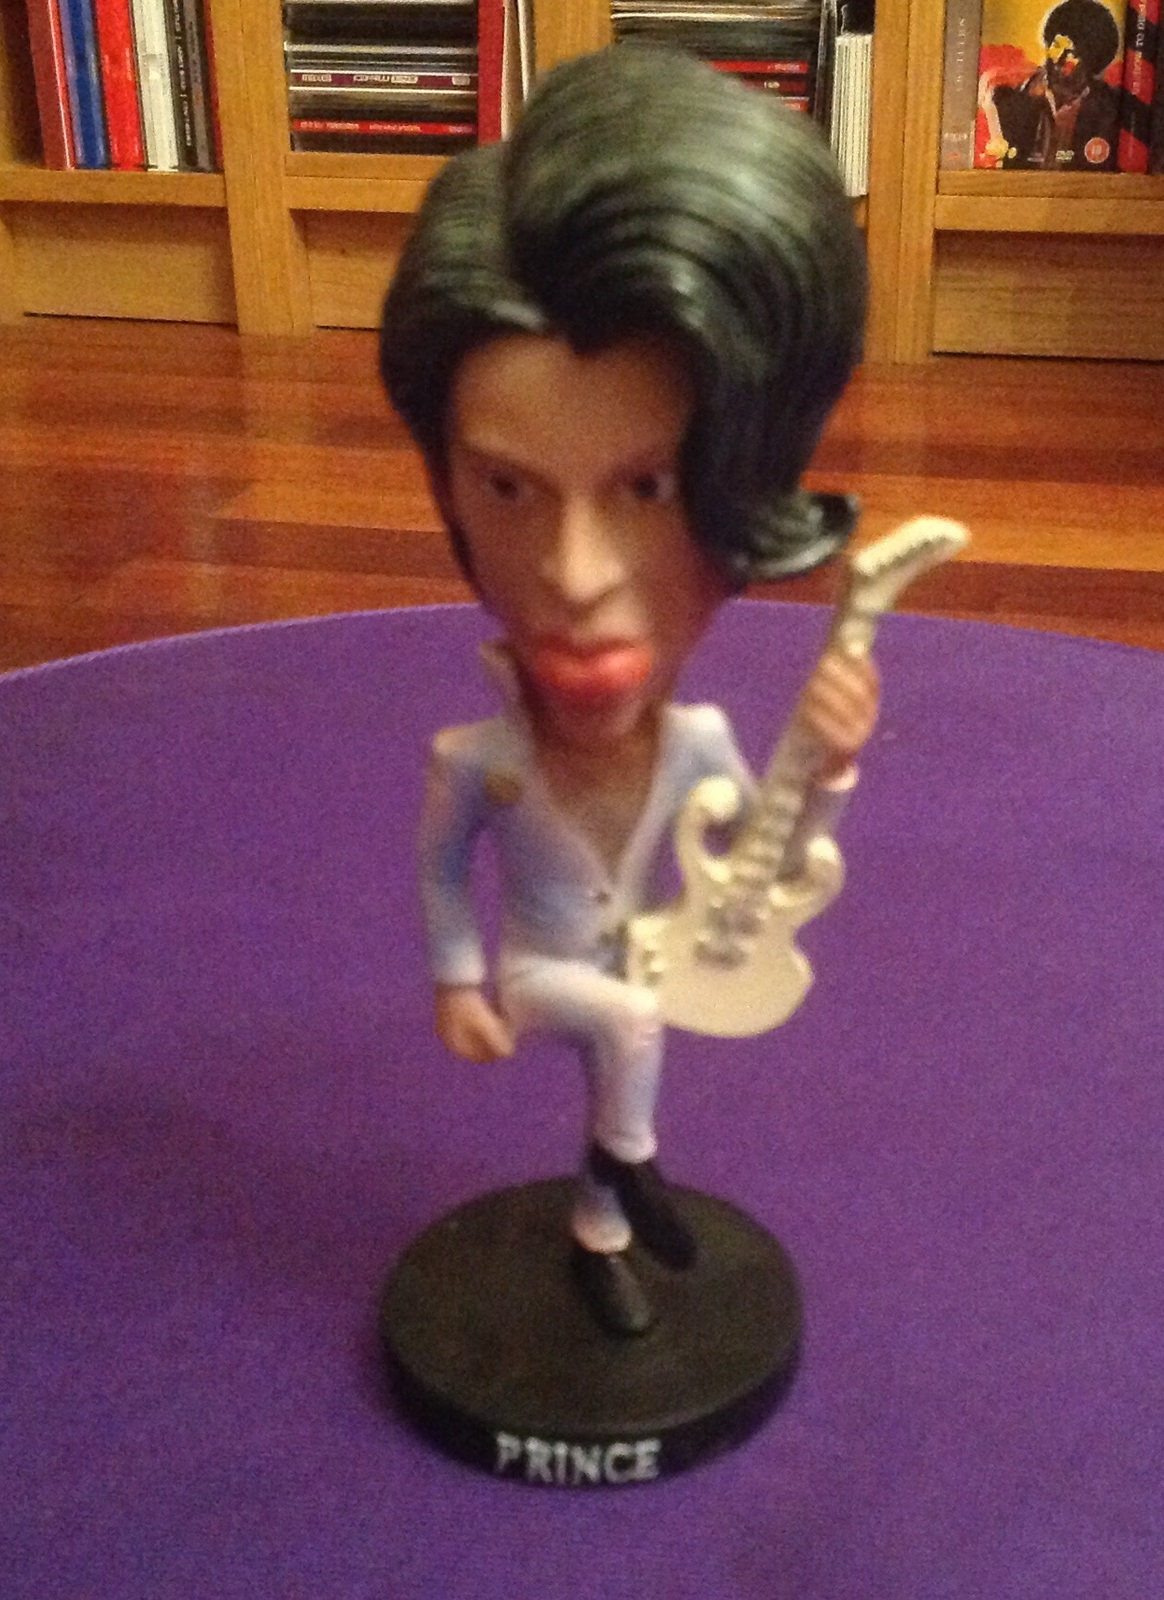 how to play prince purple rain on guitar